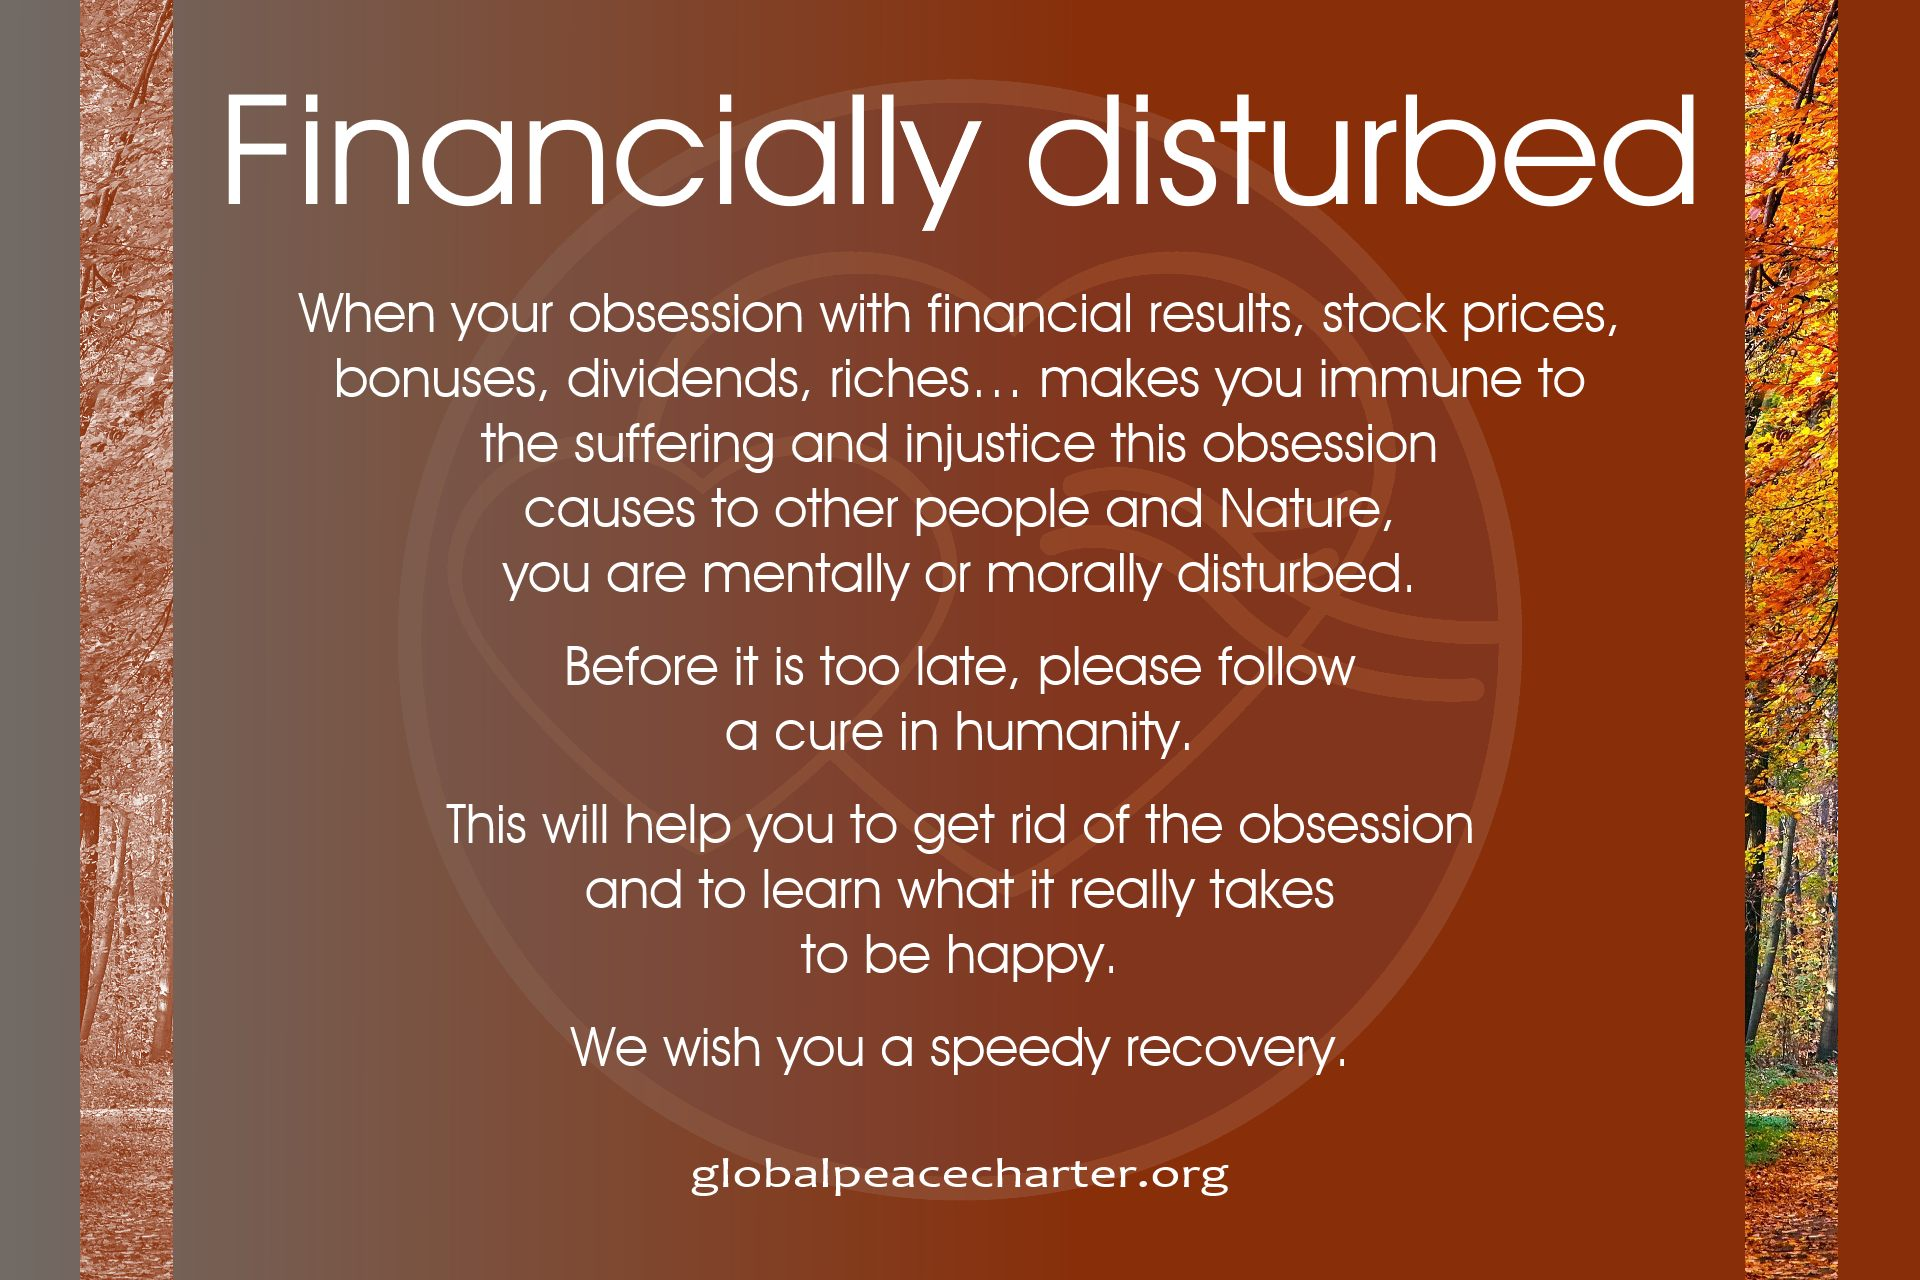 Financially disturbed